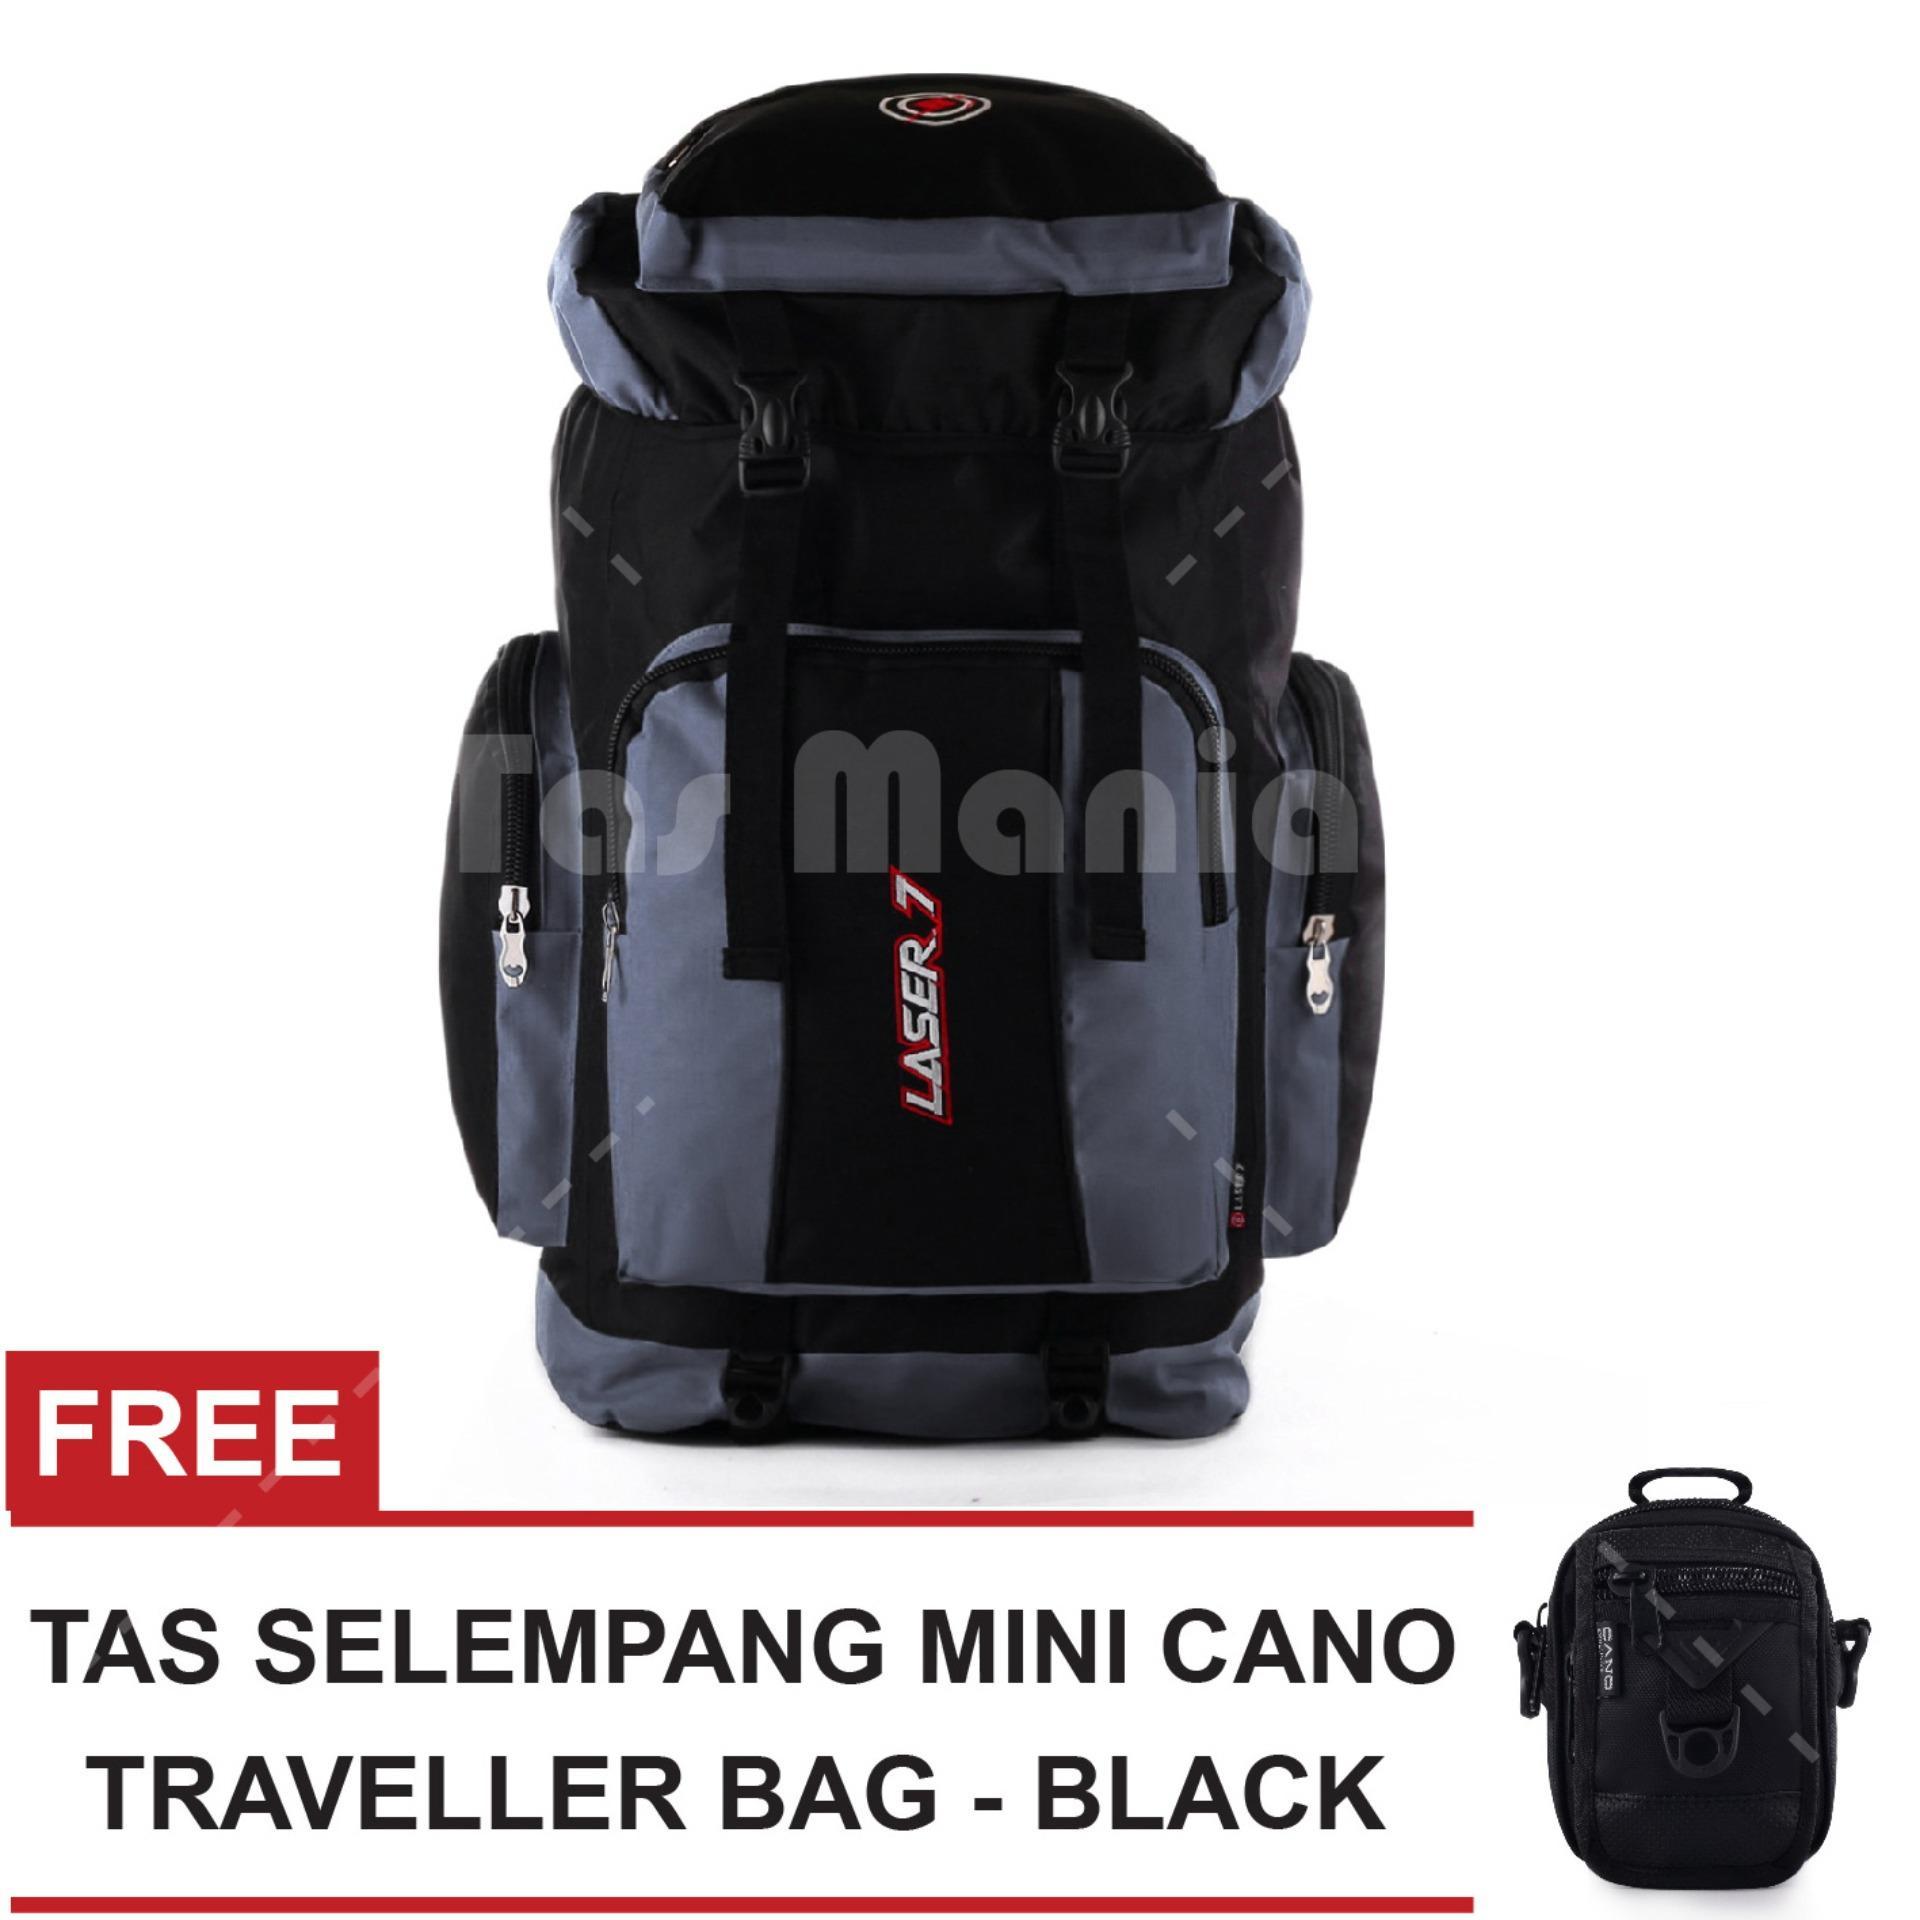 ... Harga promo mudik lebaran tas ransel mudik carrier gunung laser7 the grand canyon beaverhead backpacking backpack